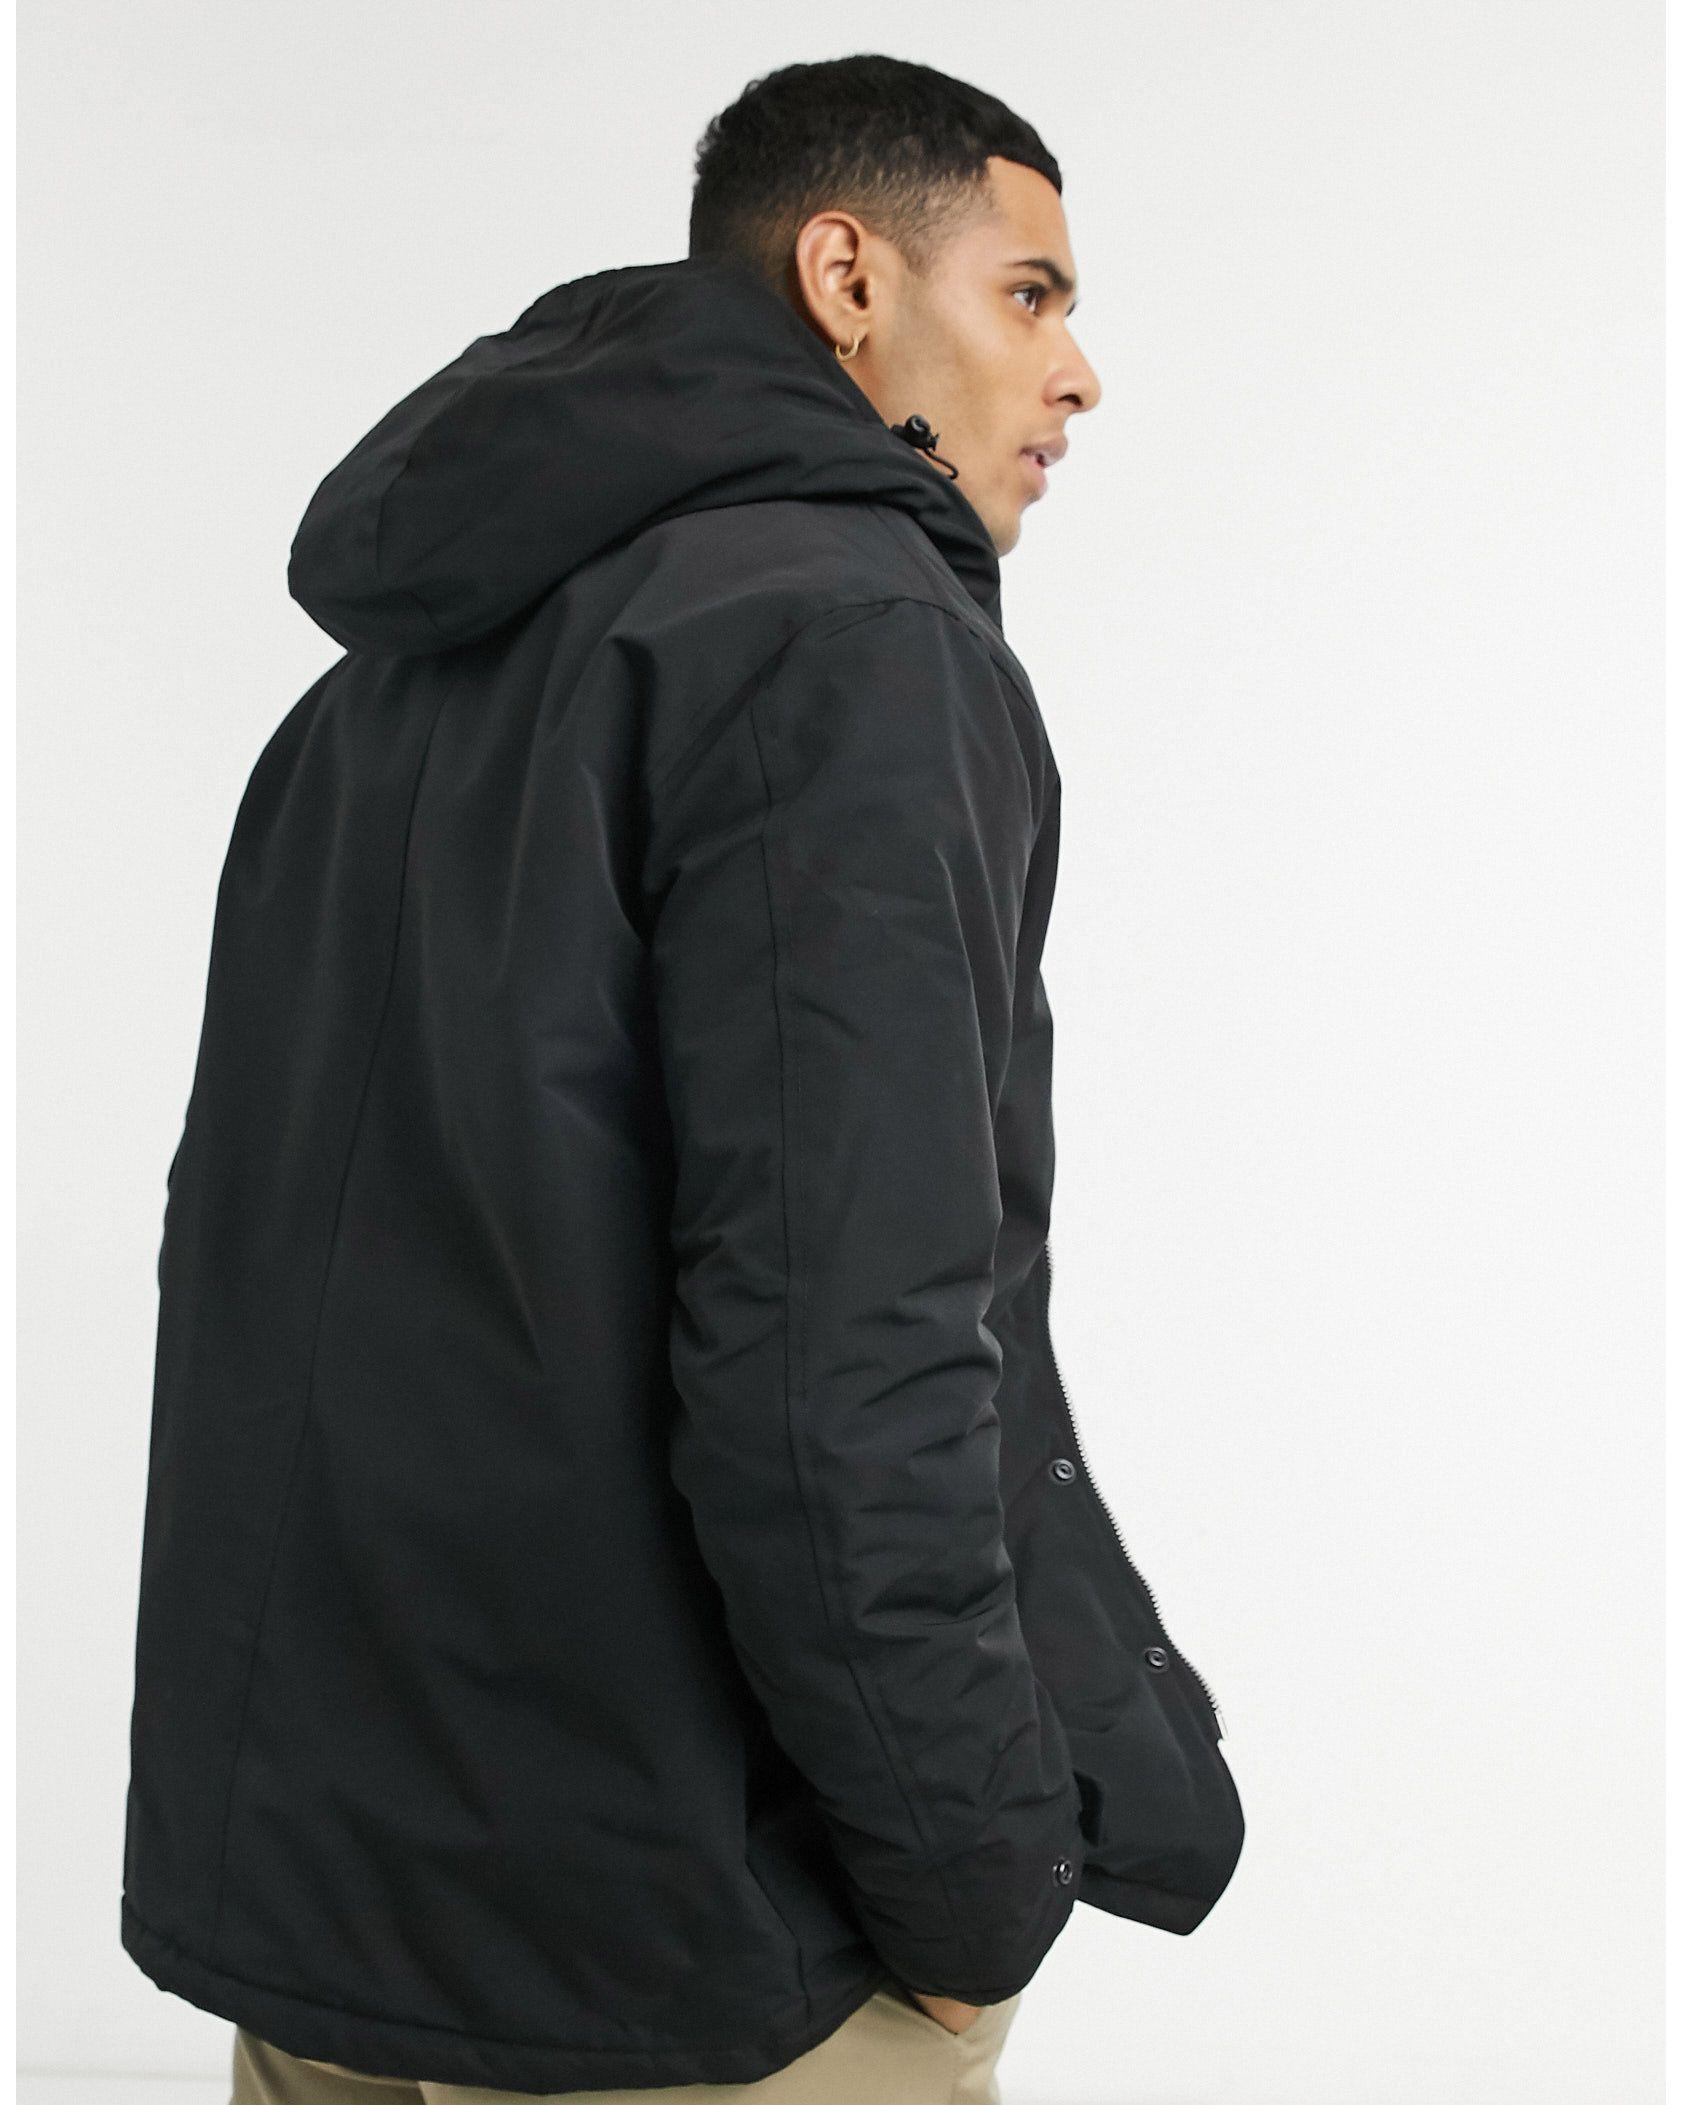 Schott hooded parka jacket in black -  Price Checker